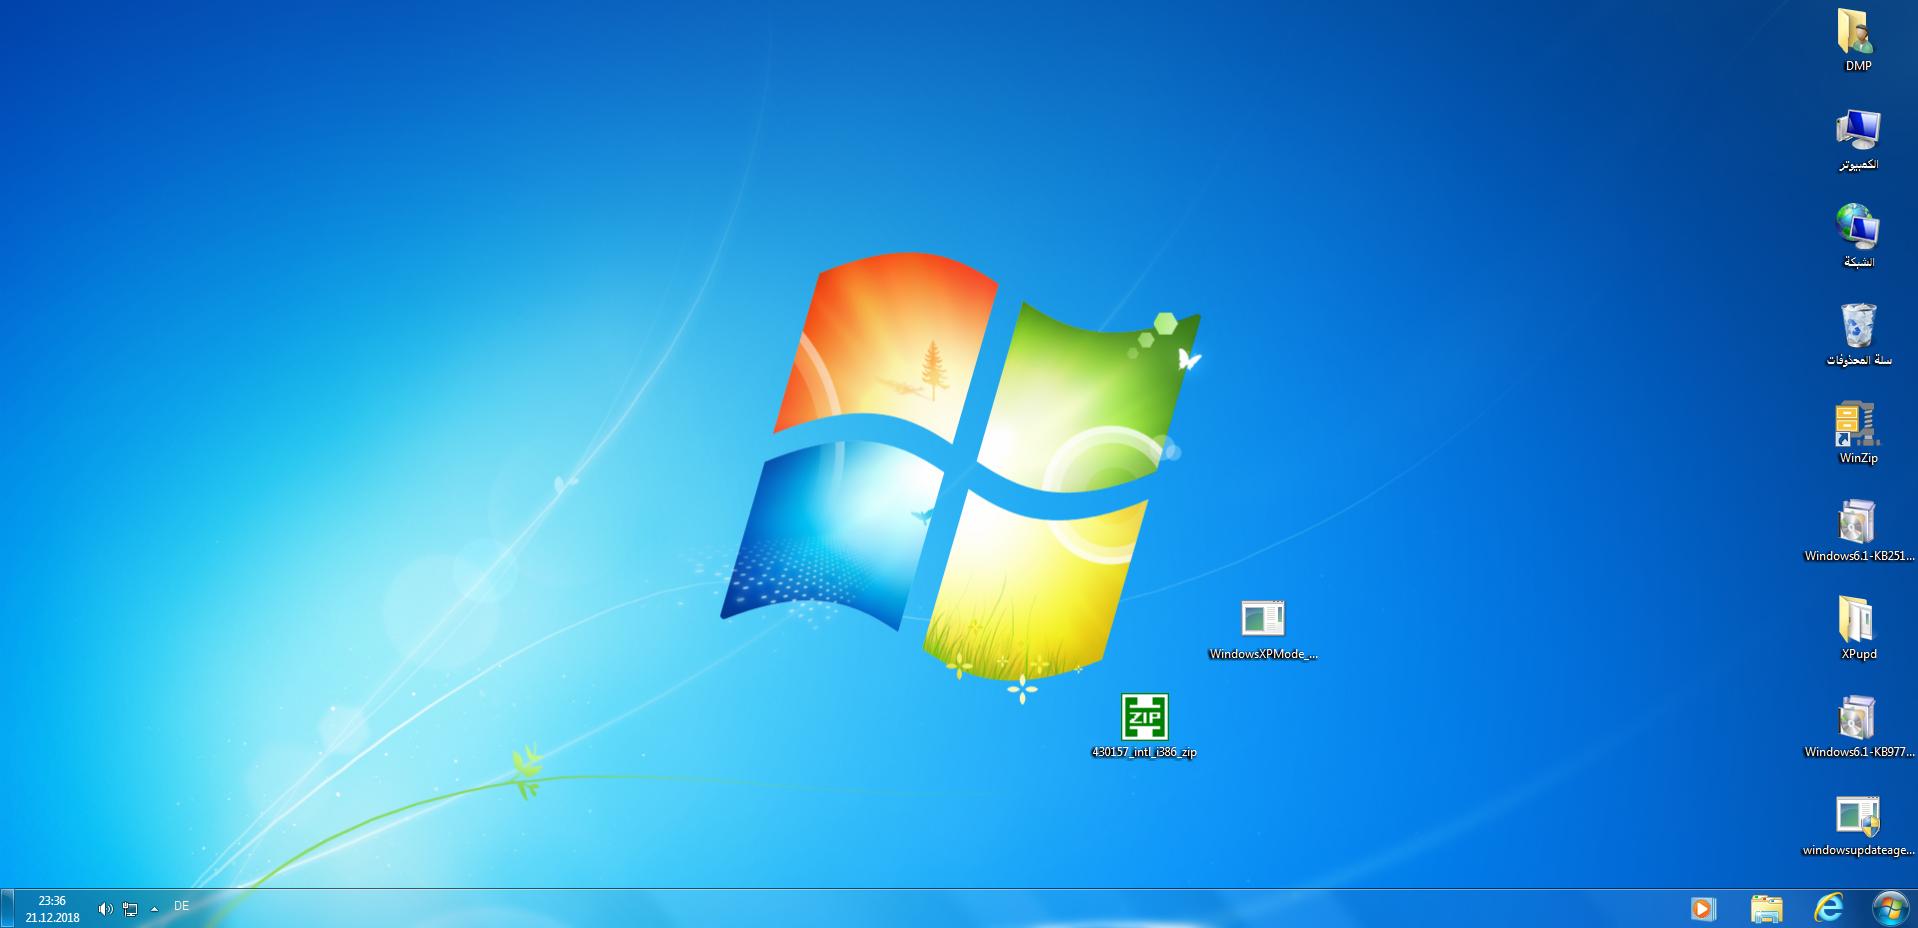 [Bild: Windows+7+Enterprise-2018-12-21-23-36-16.png]